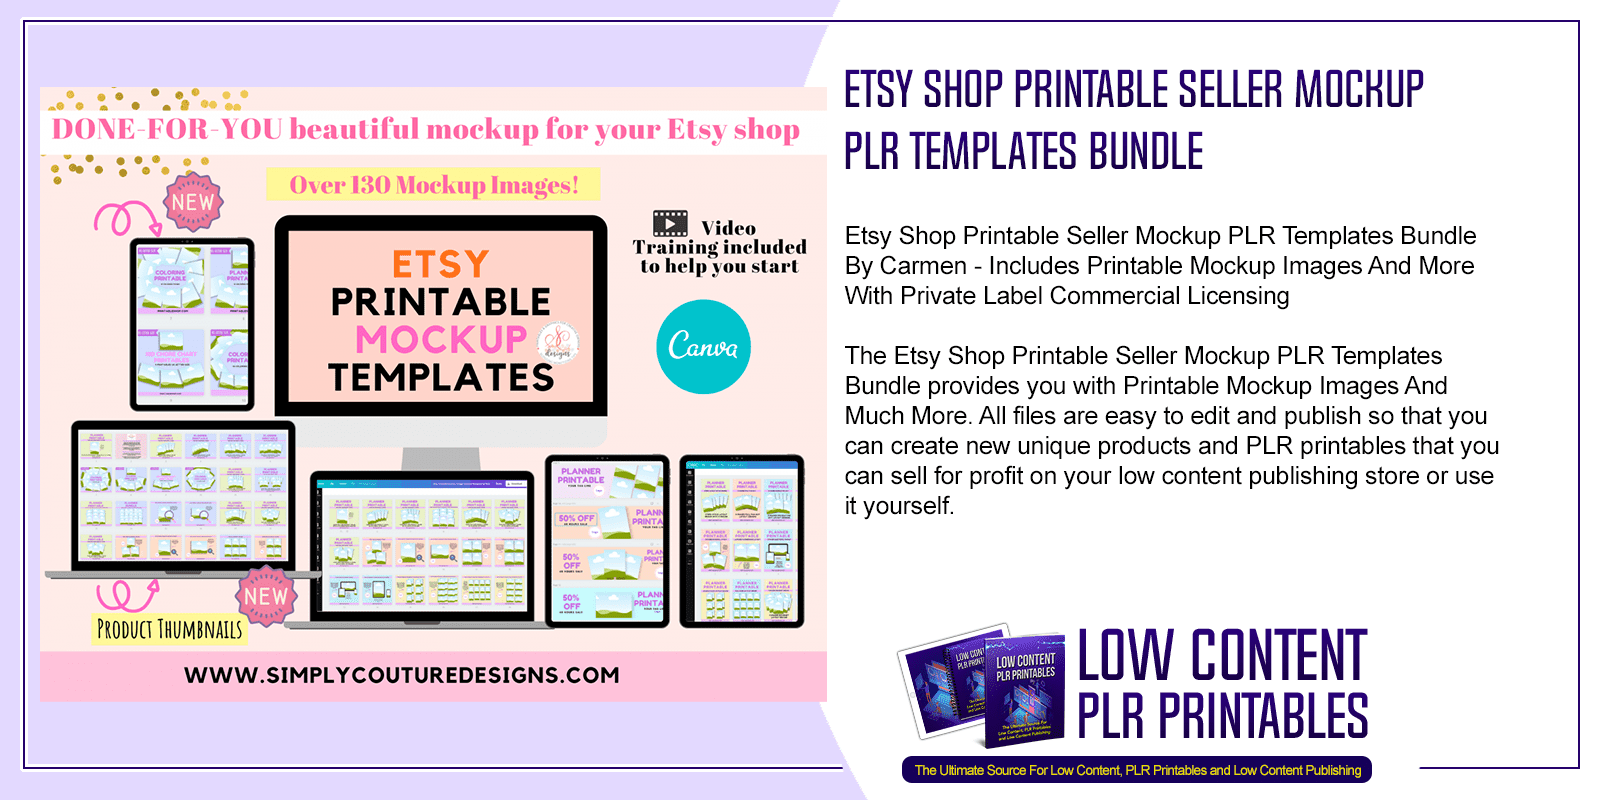 Etsy Shop Printable Seller Mockup PLR Templates Bundle